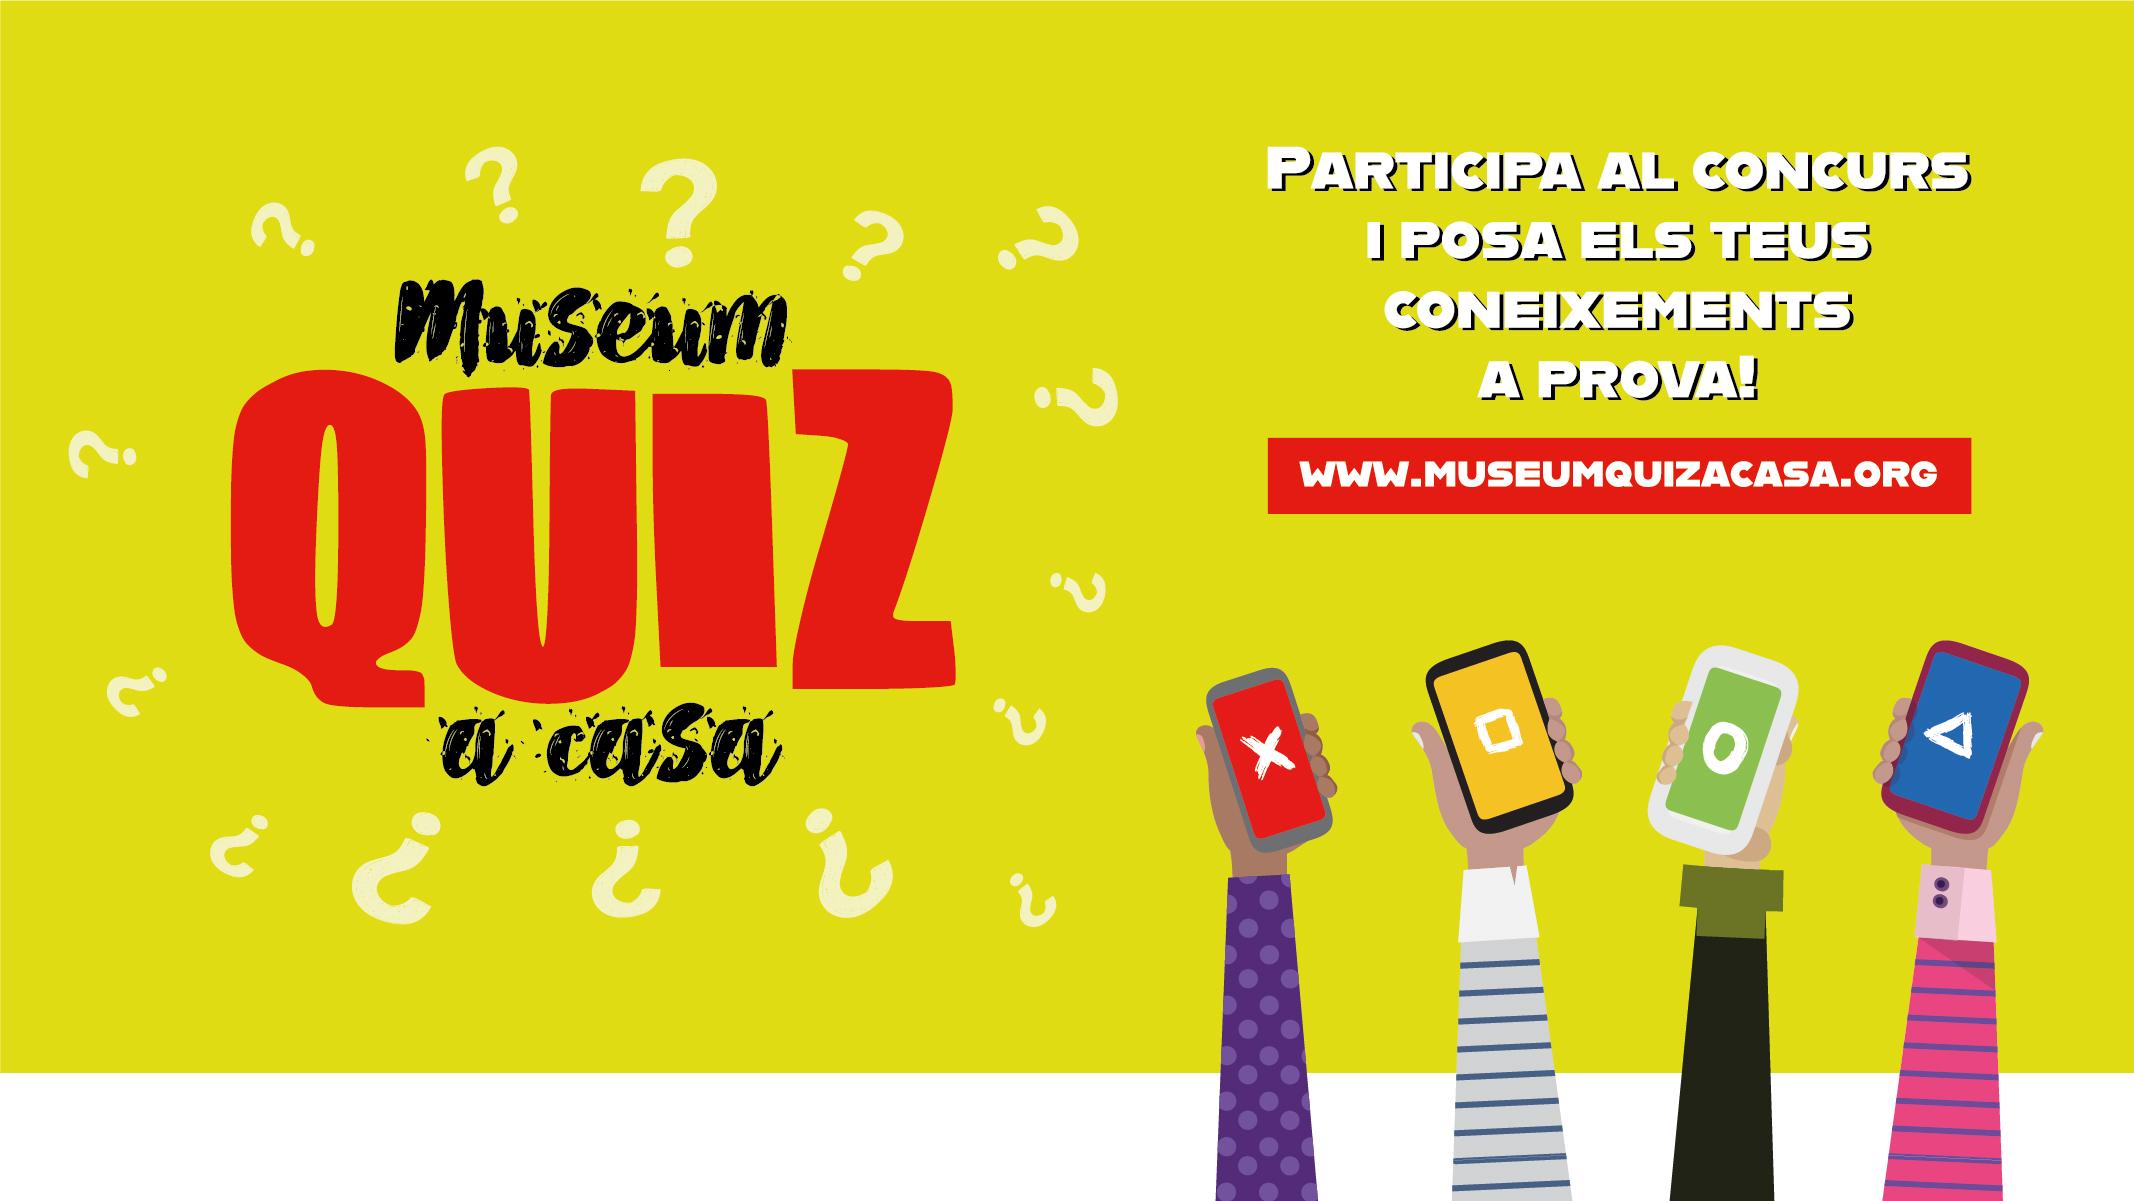 Concurs #MuseumQuizACasa confinament